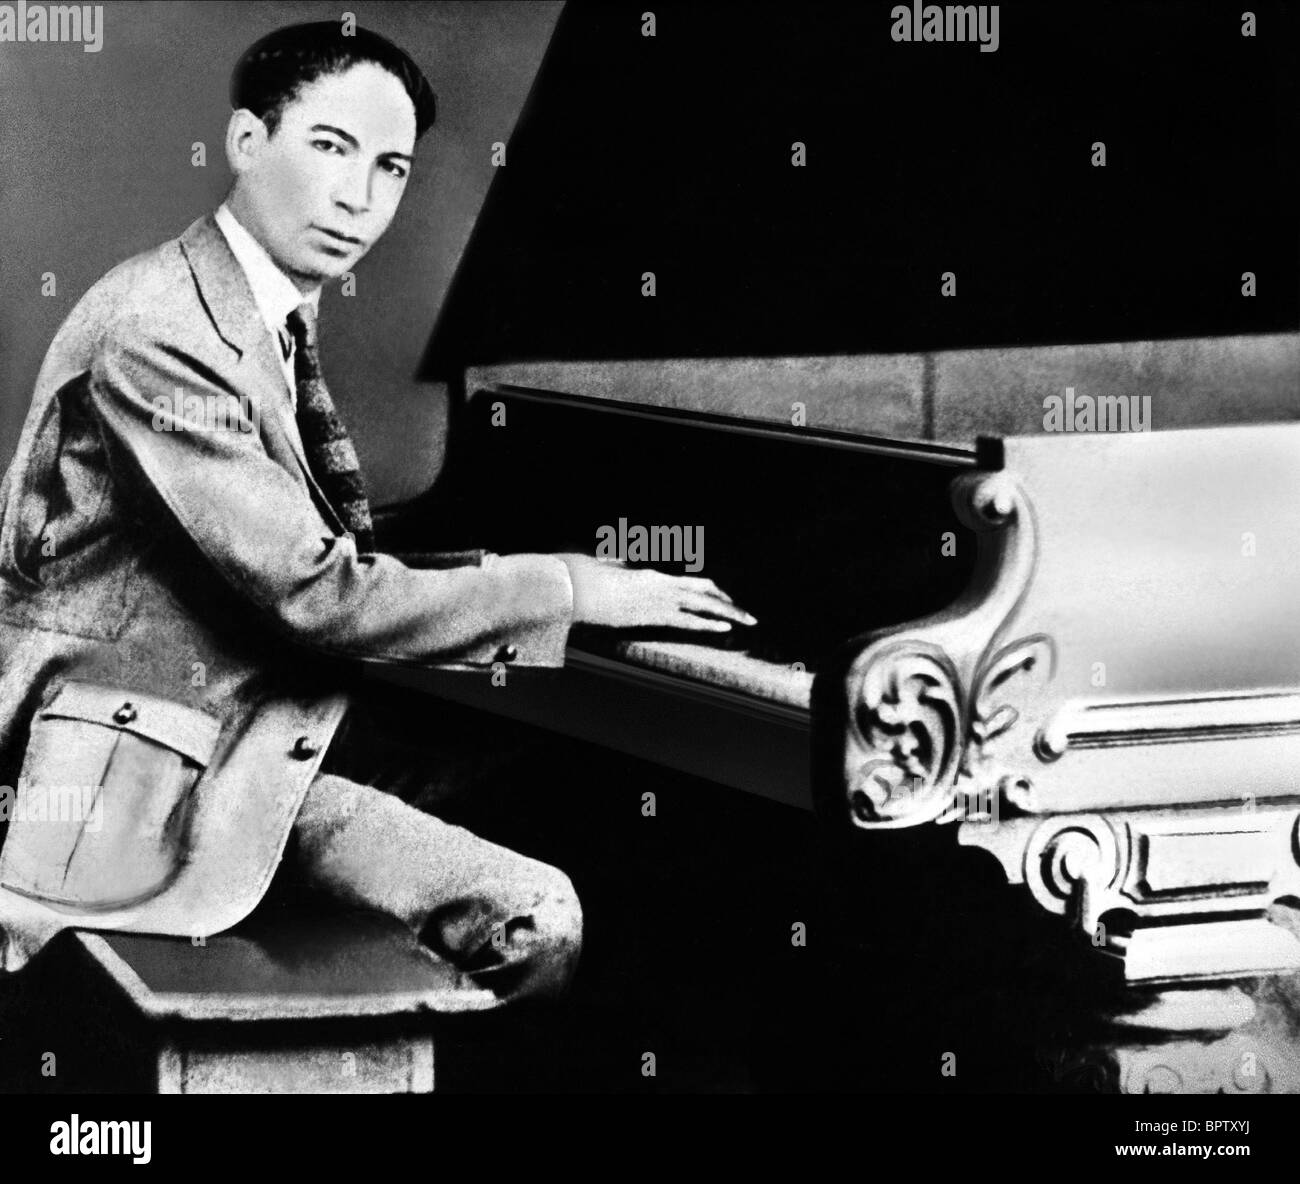 Jelly Roll Morton Pianist Stock Photo